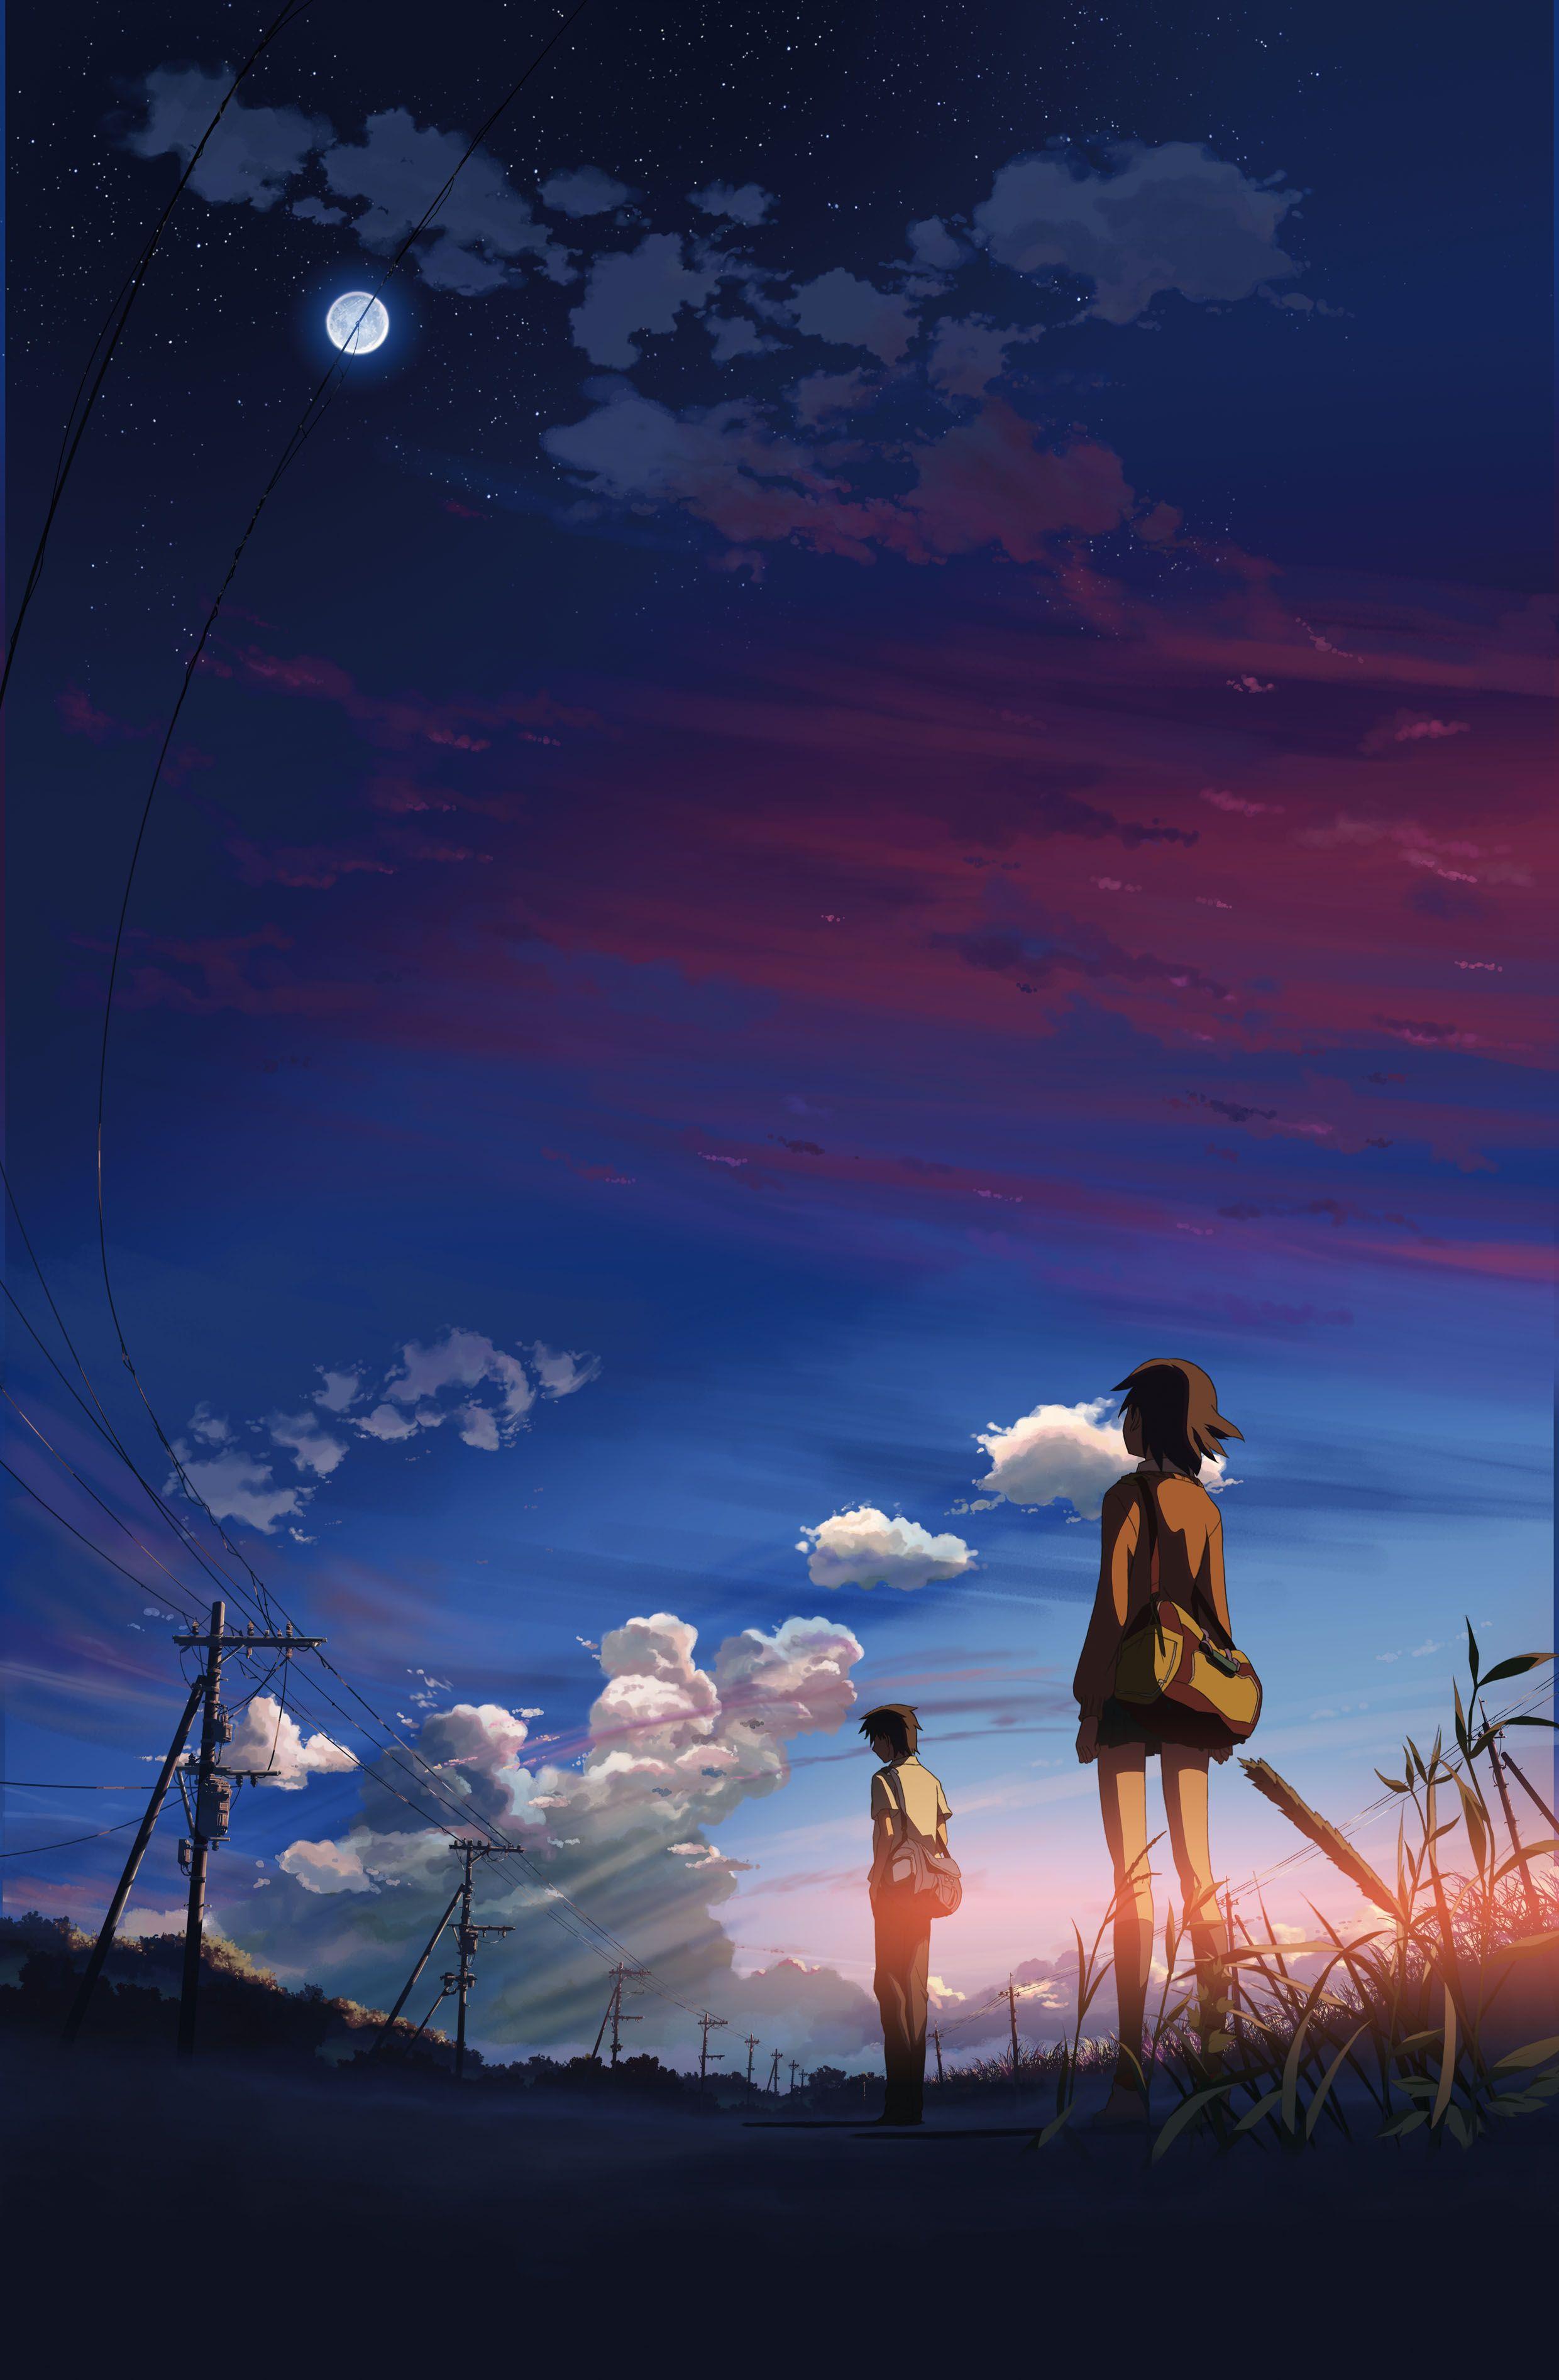 Anime Background Moving : anime, background, moving, Animated, Wallpapers, Android, 1080x1920, Light, Stars, Night, Pemandangan,, Pemandangan, Khayalan,, Anime